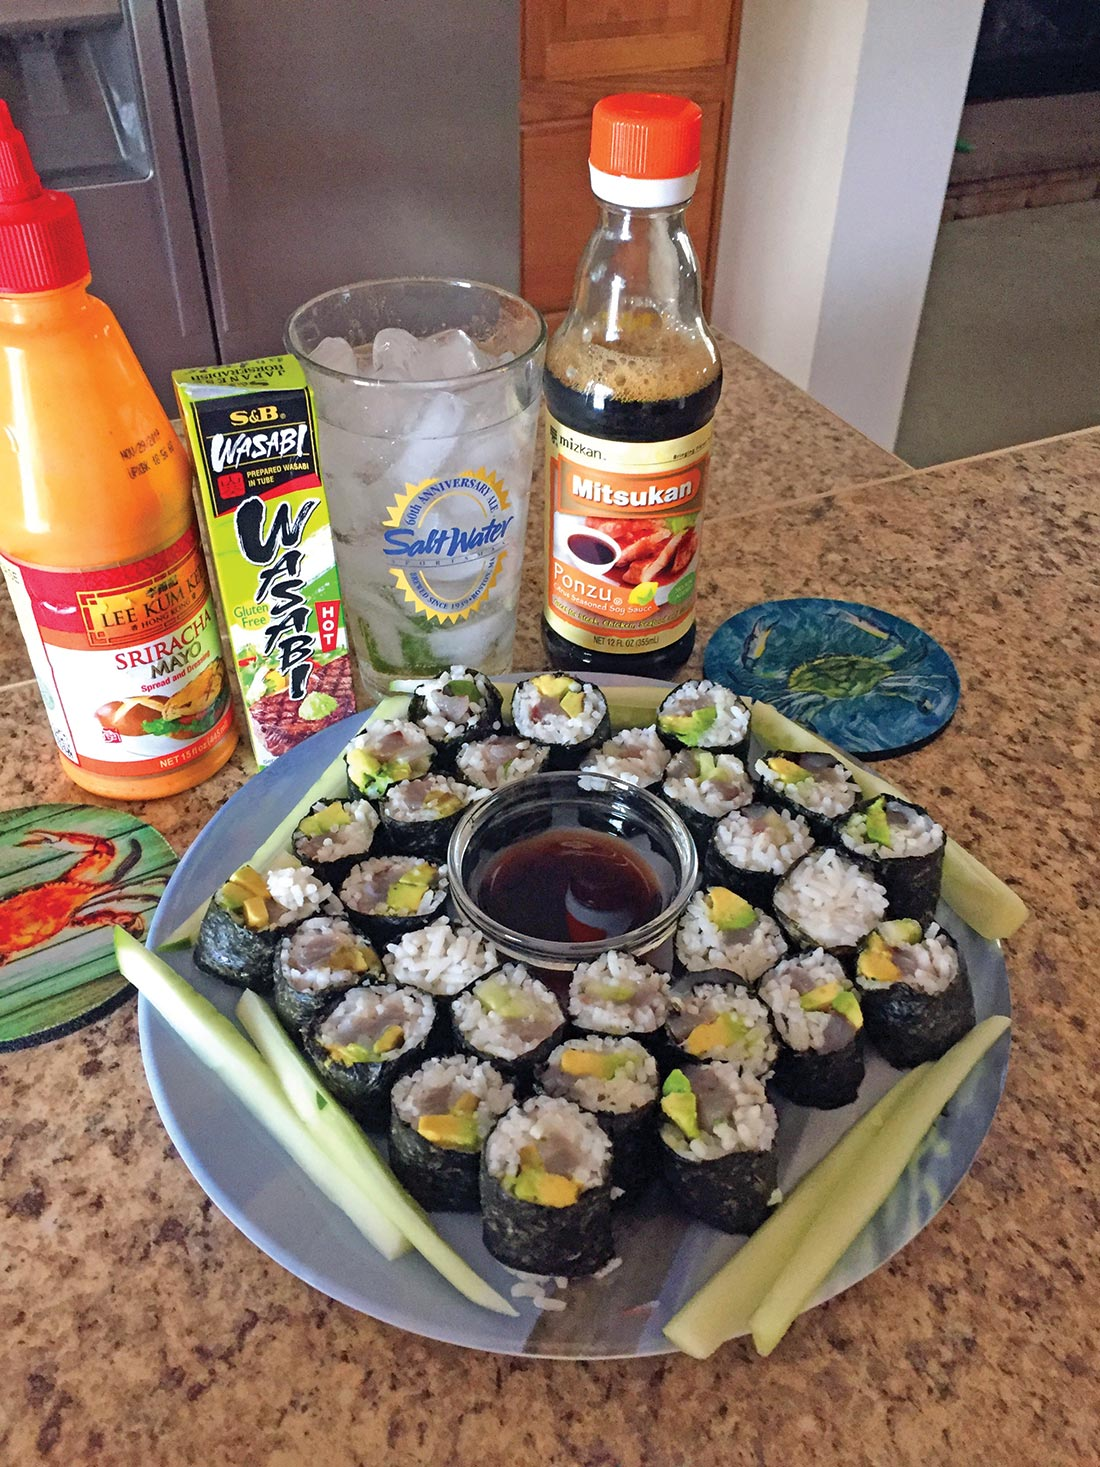 One of the author's favorites – bluefish sushi.